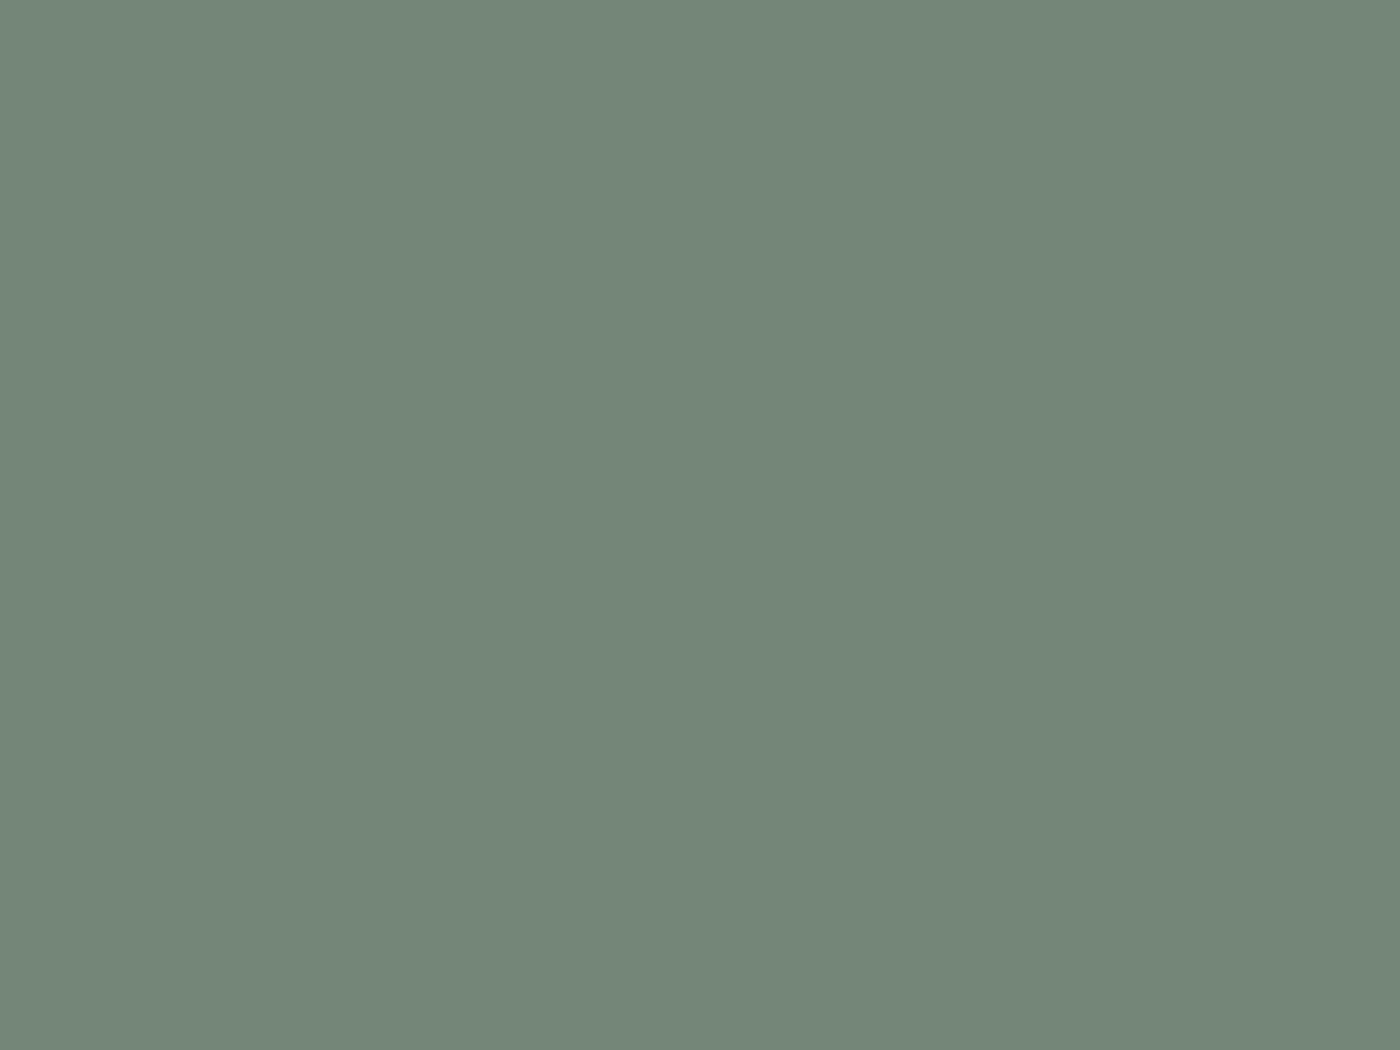 1400x1050 Xanadu Solid Color Background